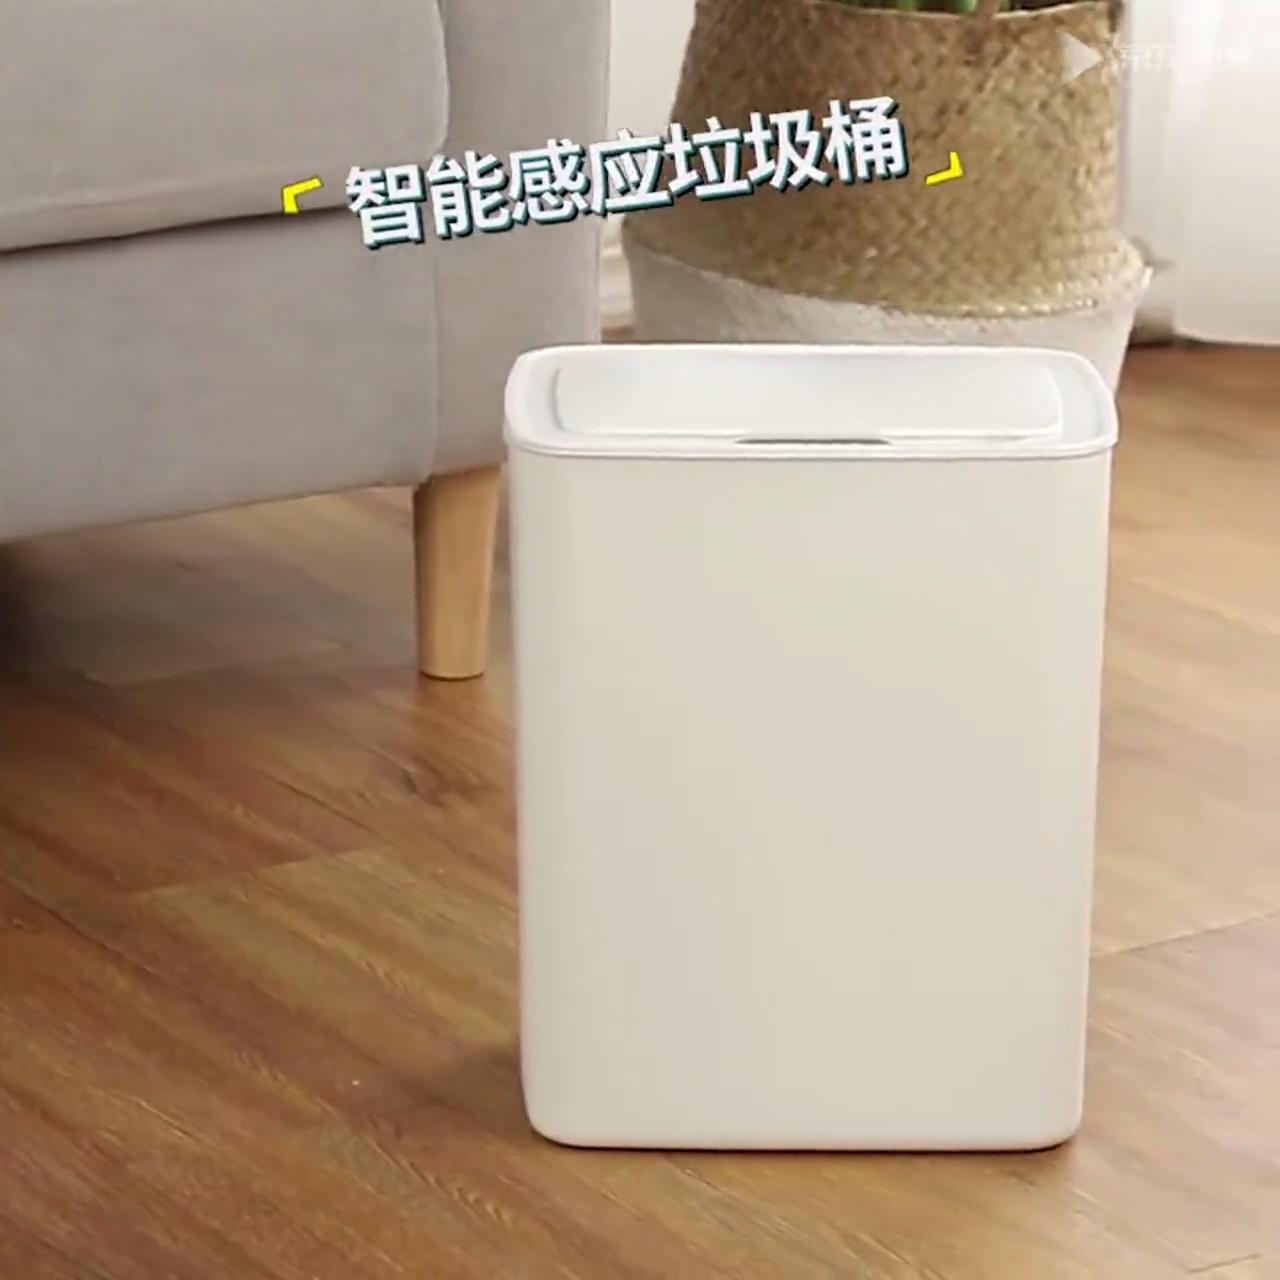 Intelligent Sensing Trash Can 14L Automático Sensor Inteligente Elétrica Caixotes do Lixo De Plástico PP Casa Caixote de Lixo Ecológico